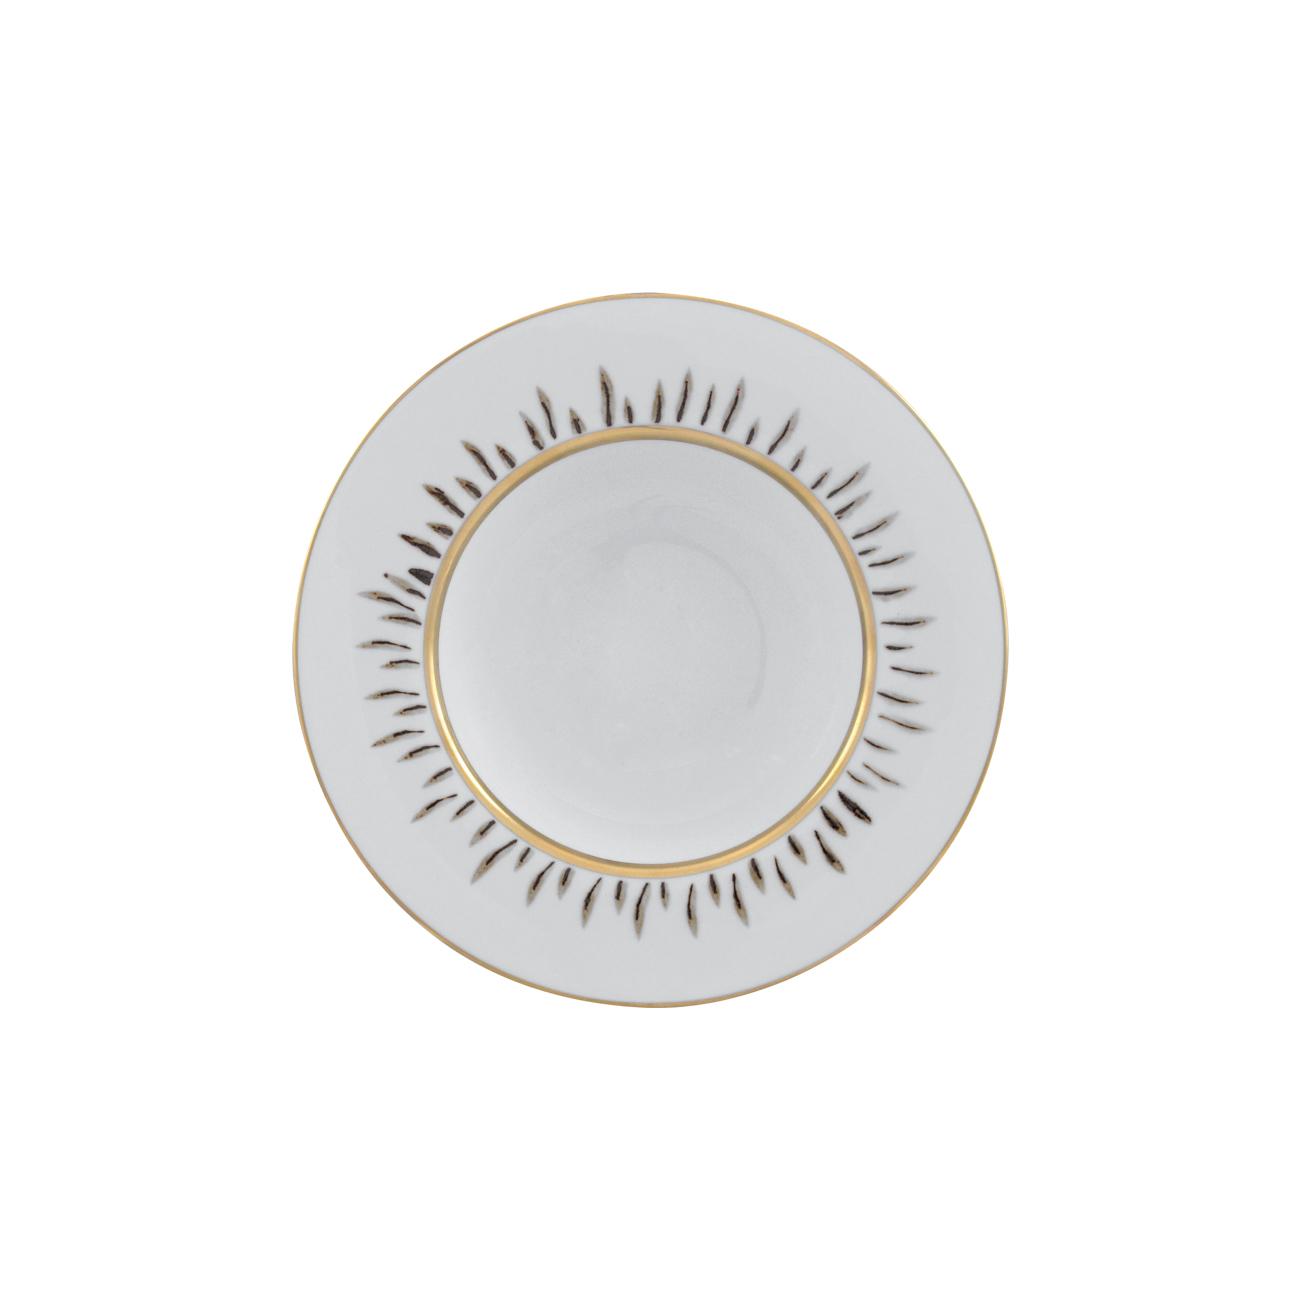 Prato Sopa 22cm Pétala Simples 76052 0608   Ø 22cm; h 4cm 0